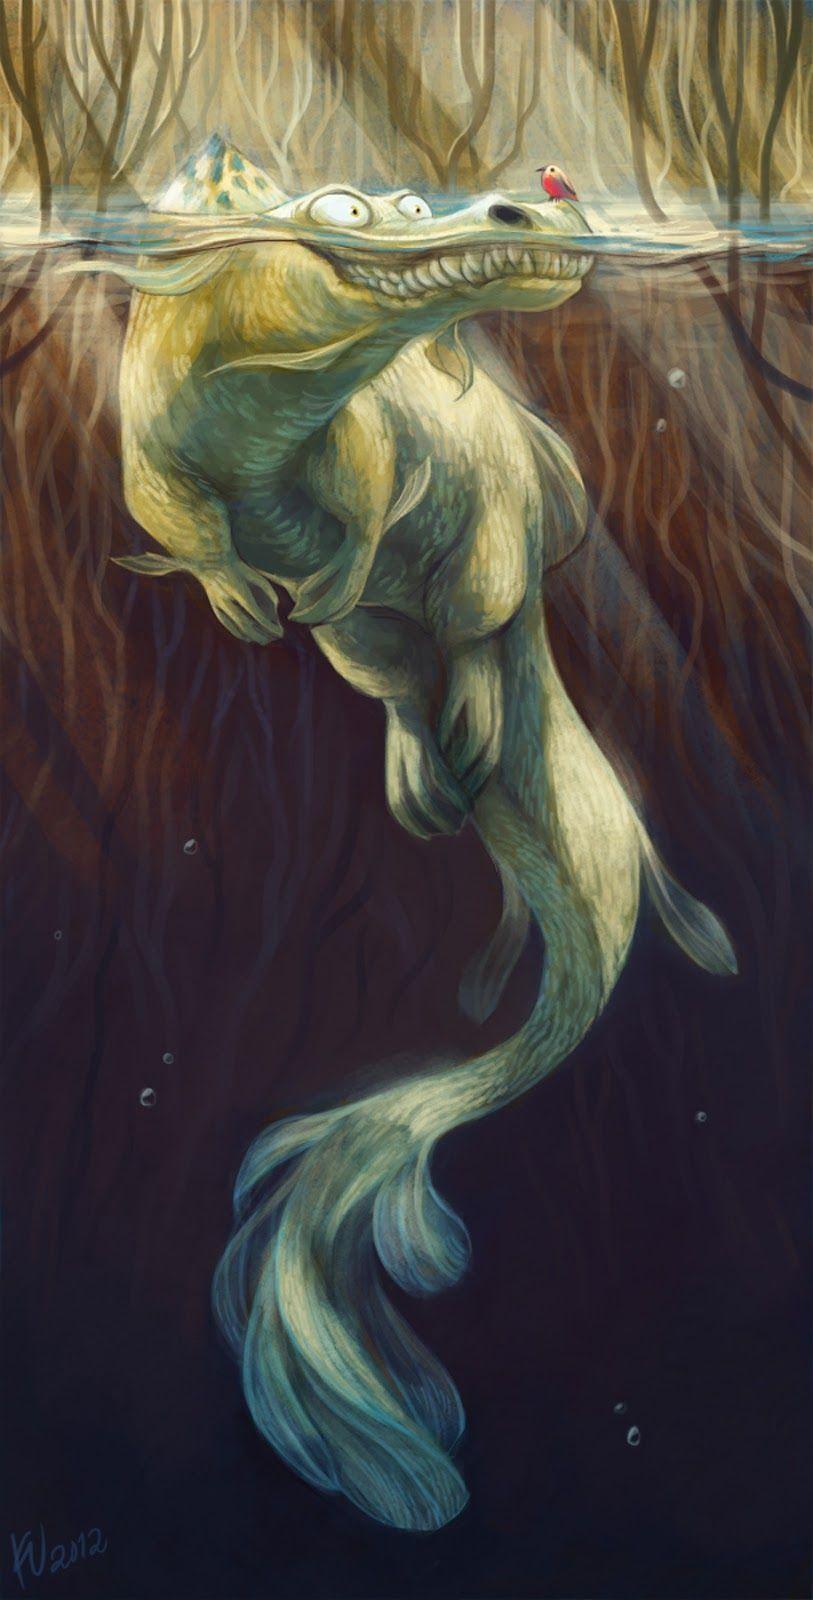 85. Gracioso monstruo marino | Bestiario | Pinterest | Monstruos ...